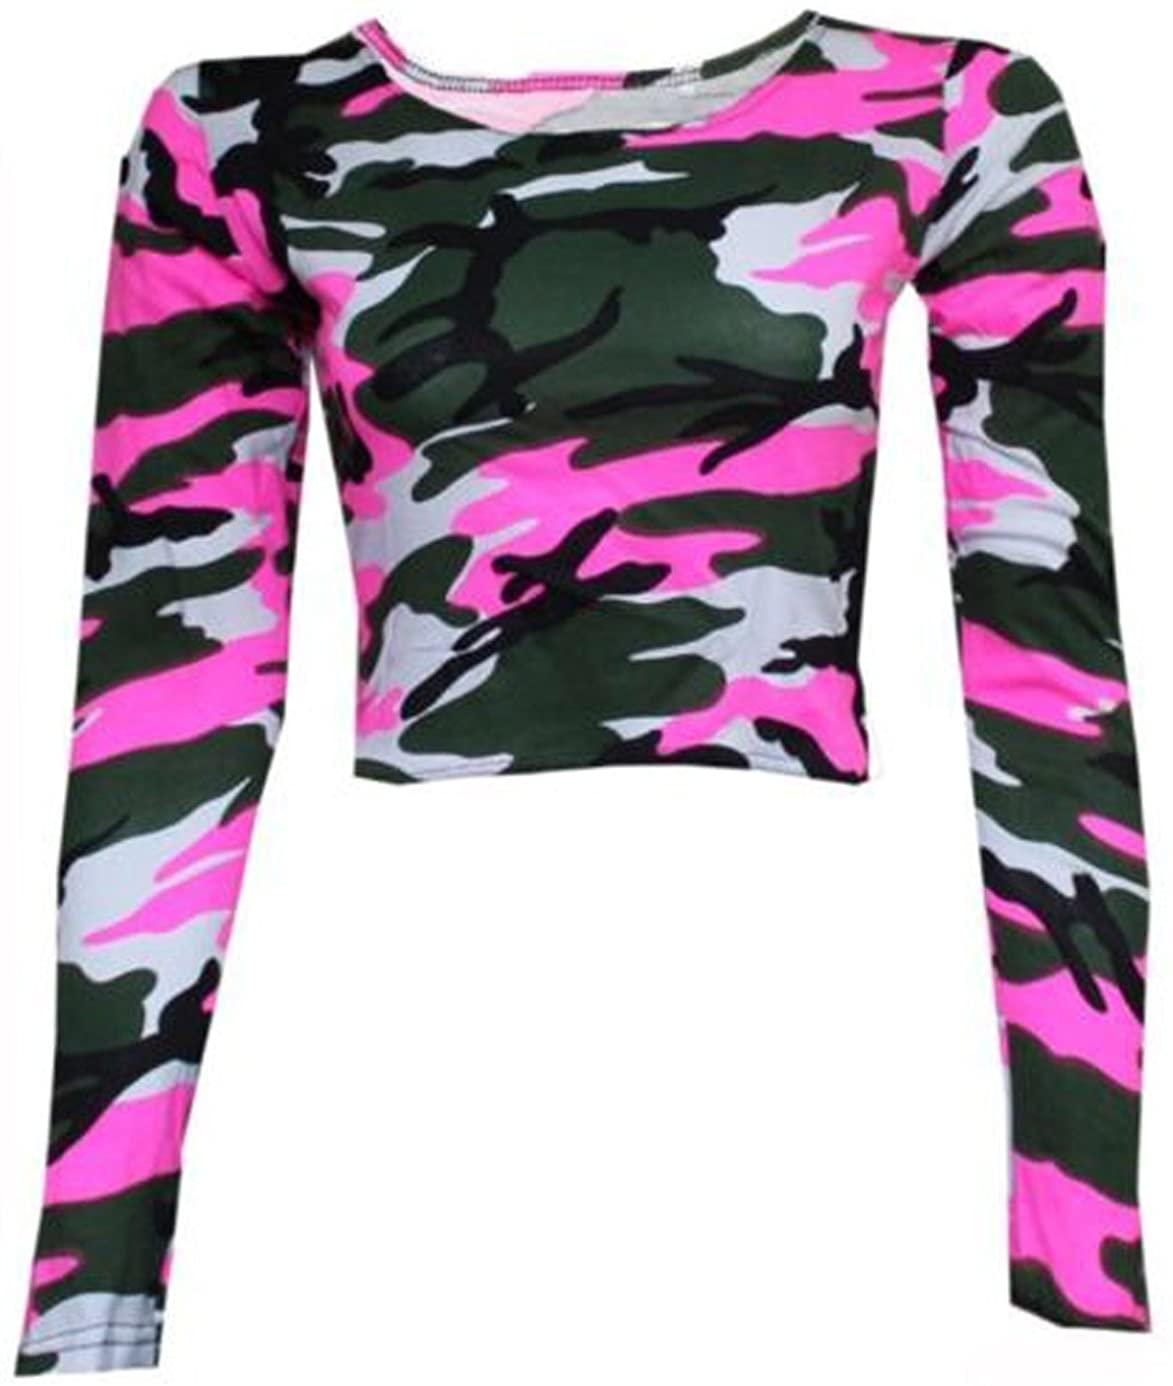 GirlsWalk Women's Long Sleeves Army Camouflage Printed Short Crop Top